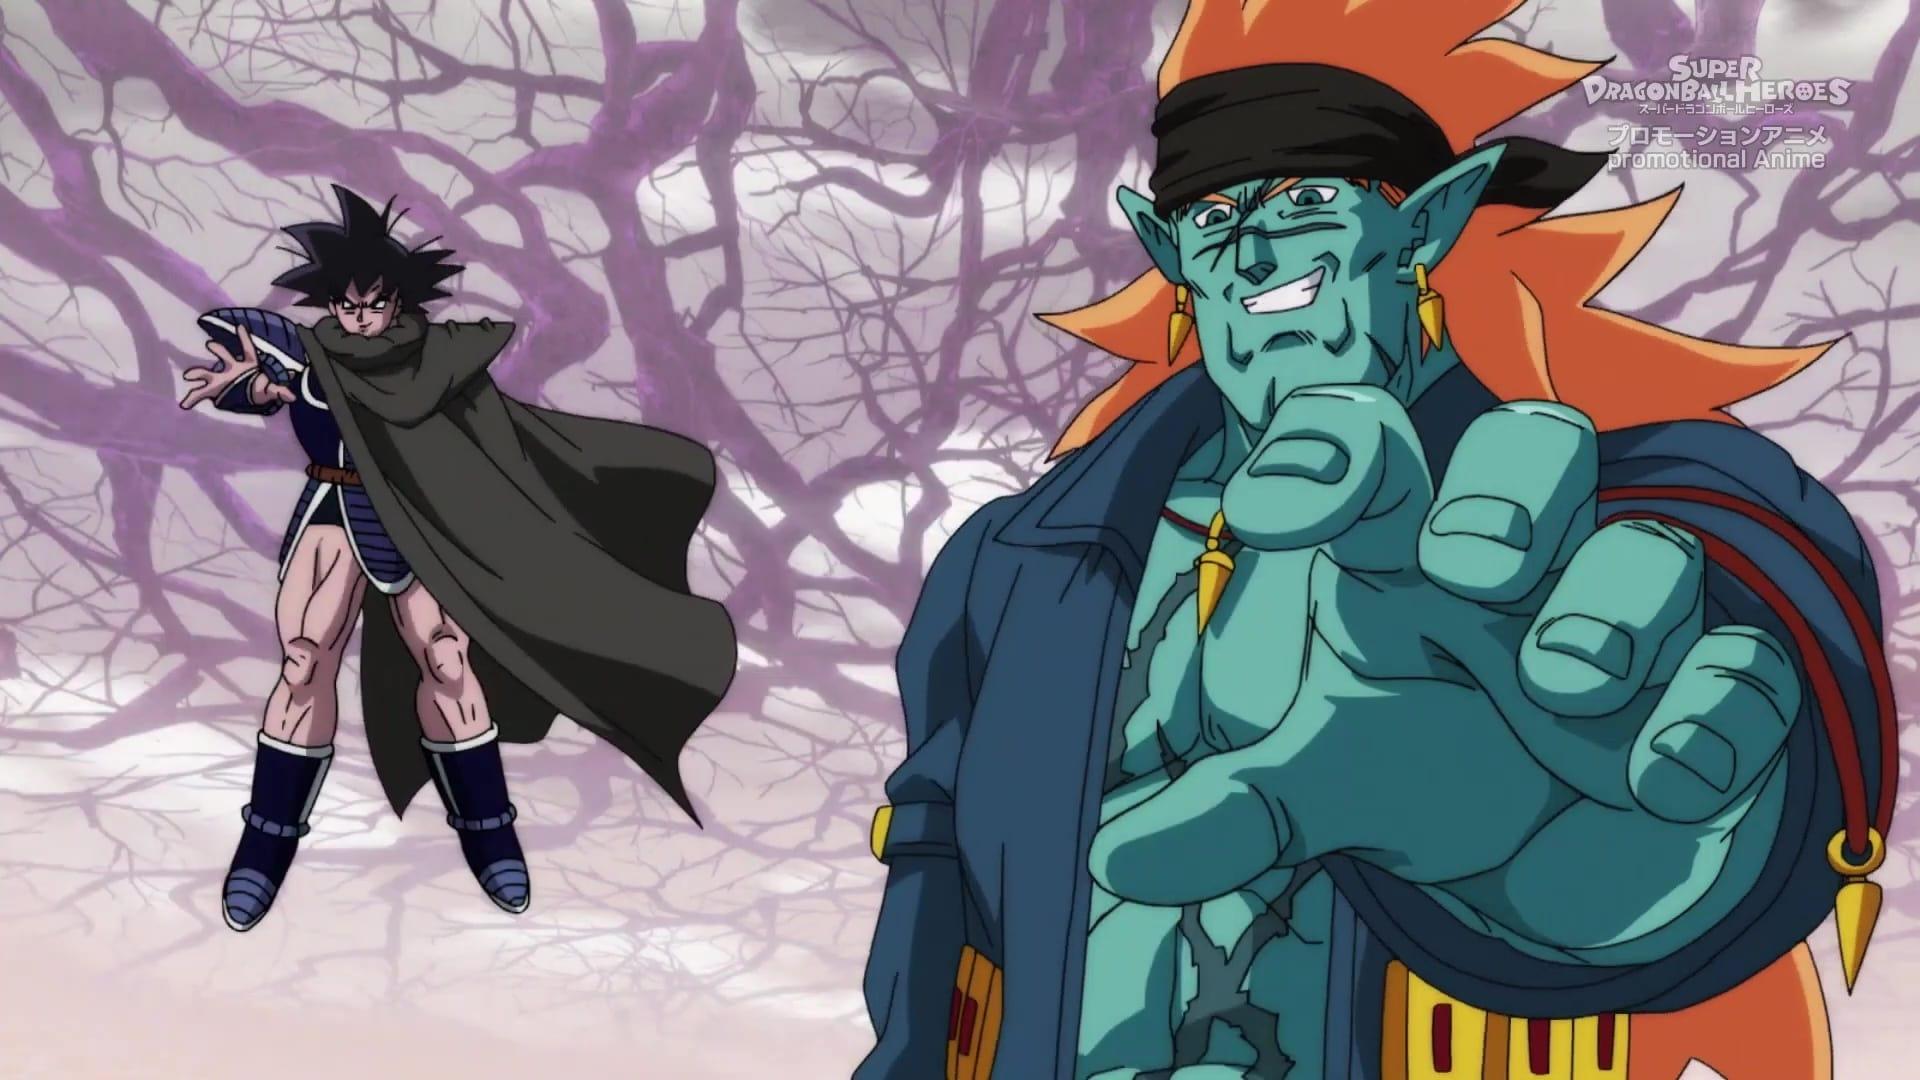 Super Dragonball Heroes Season 3 :Episode 3  Episode 3